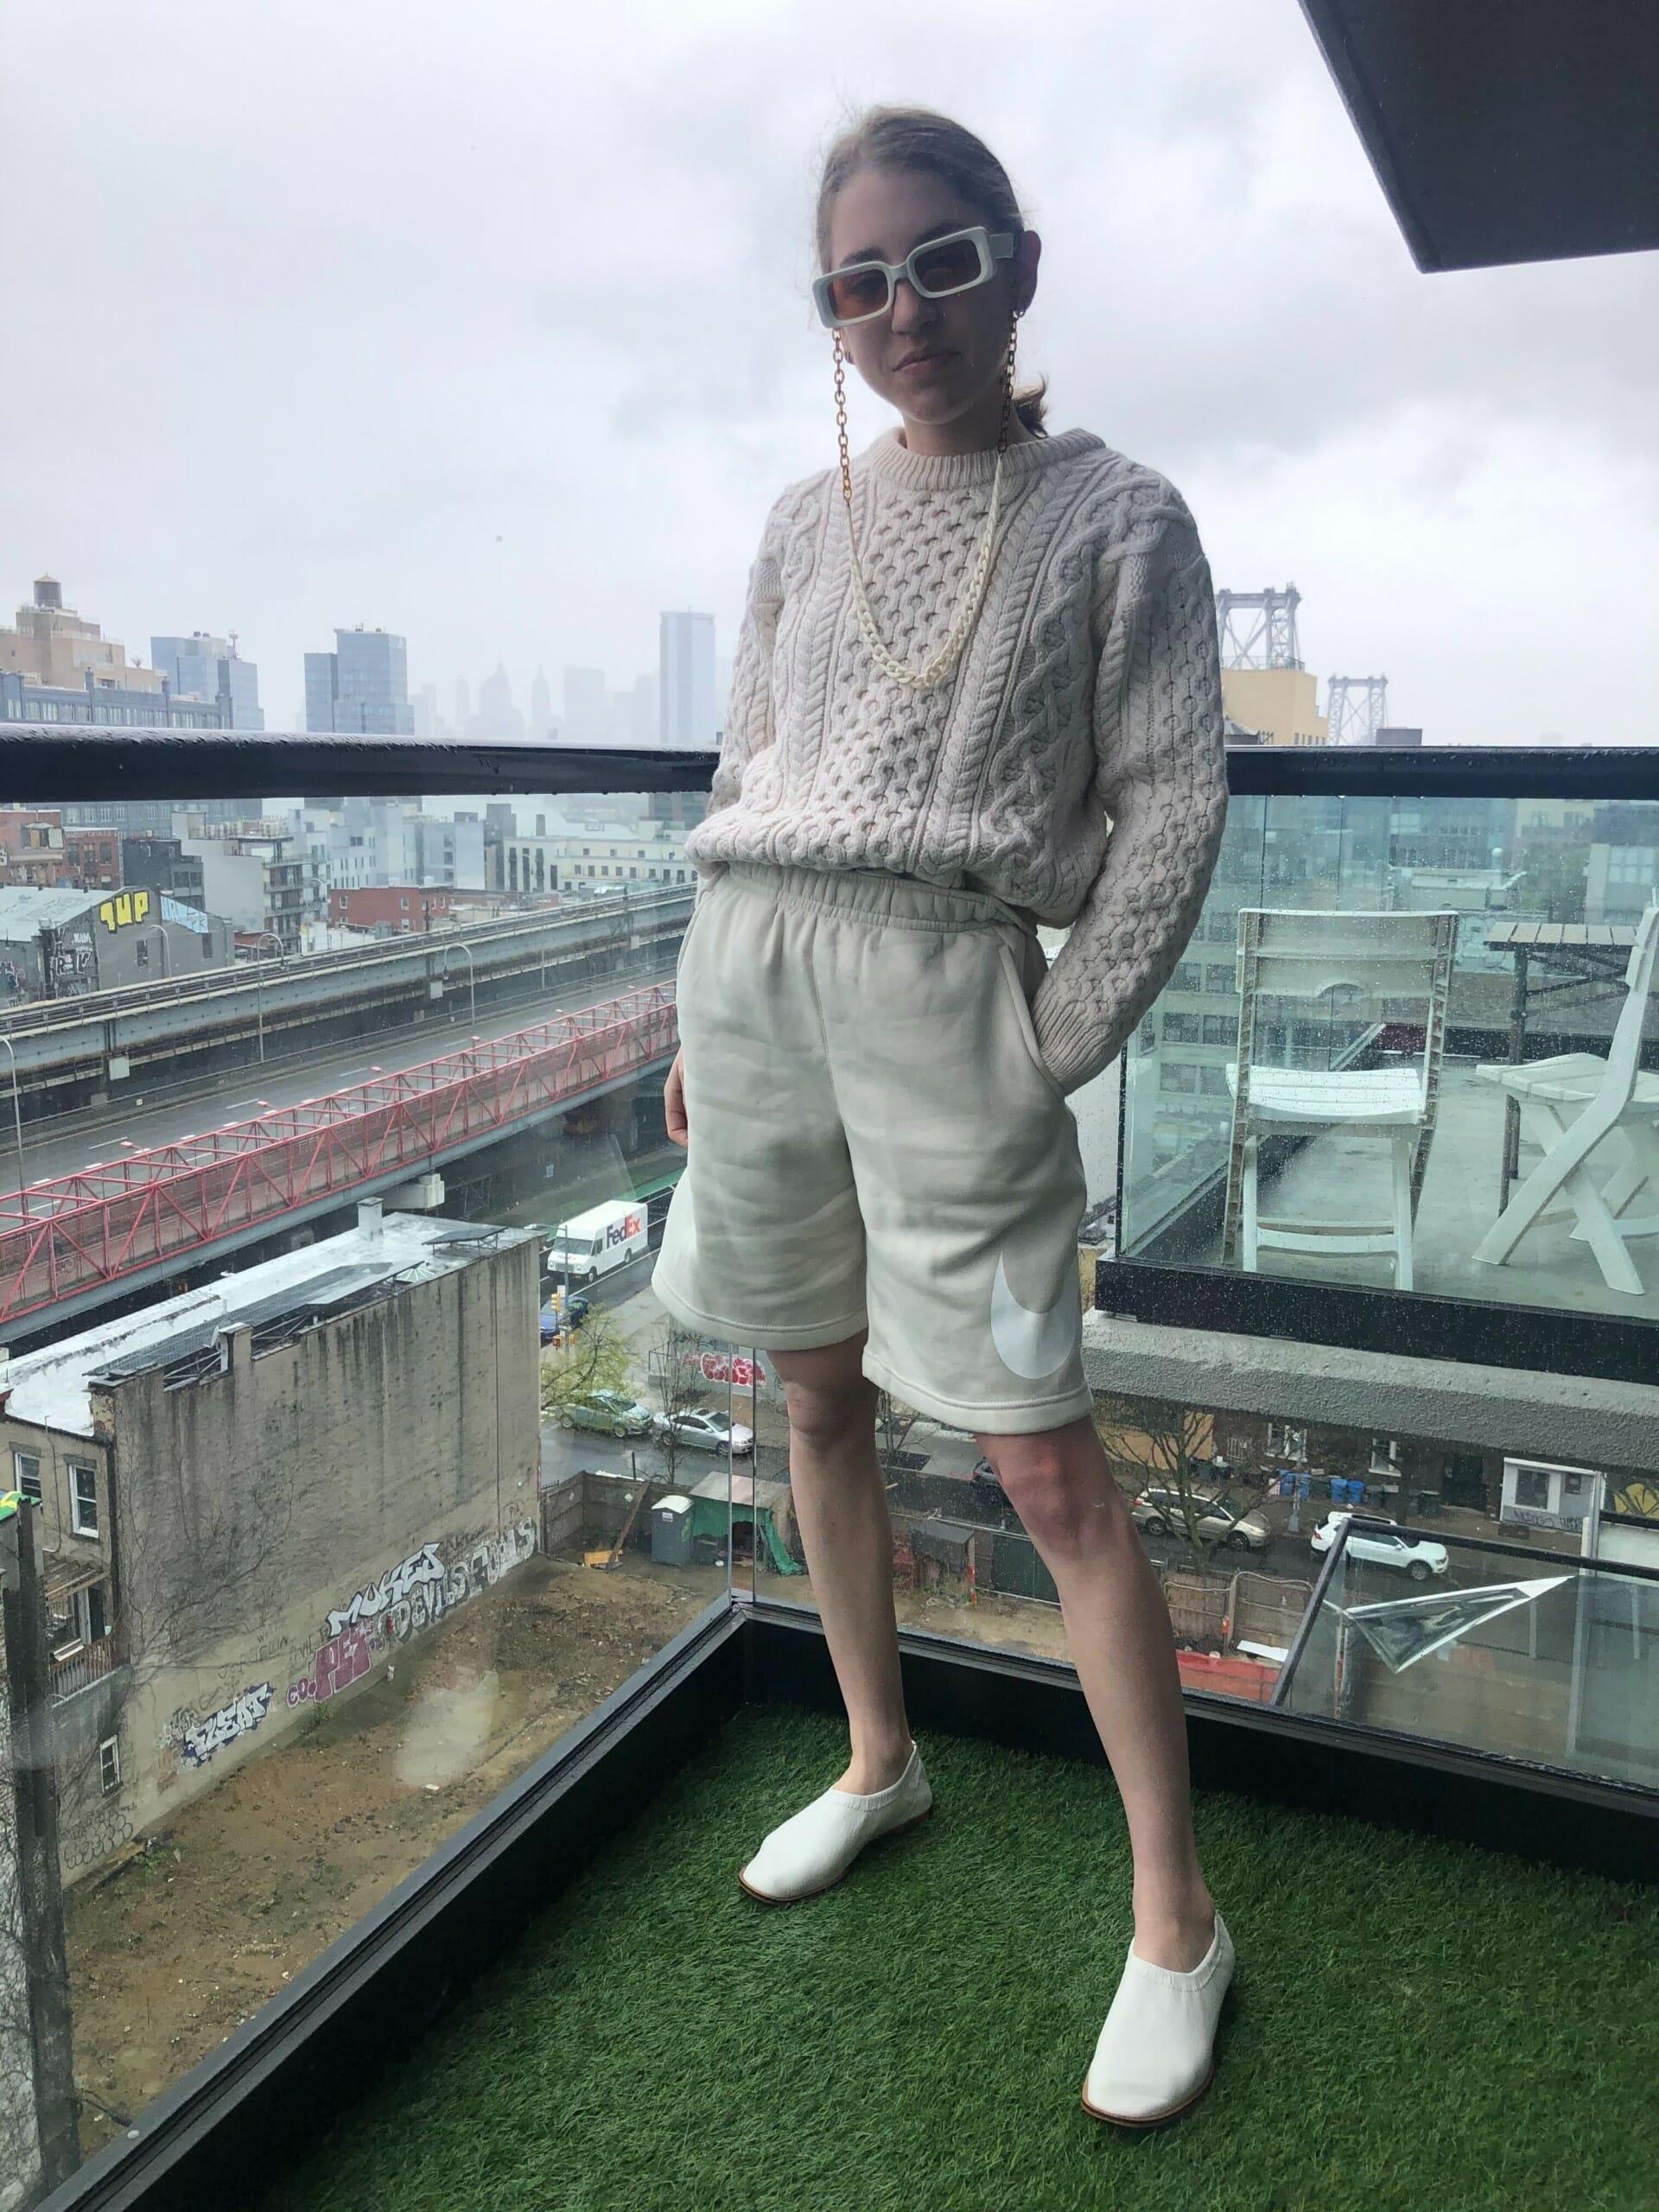 Men's Shorts Reign Supreme